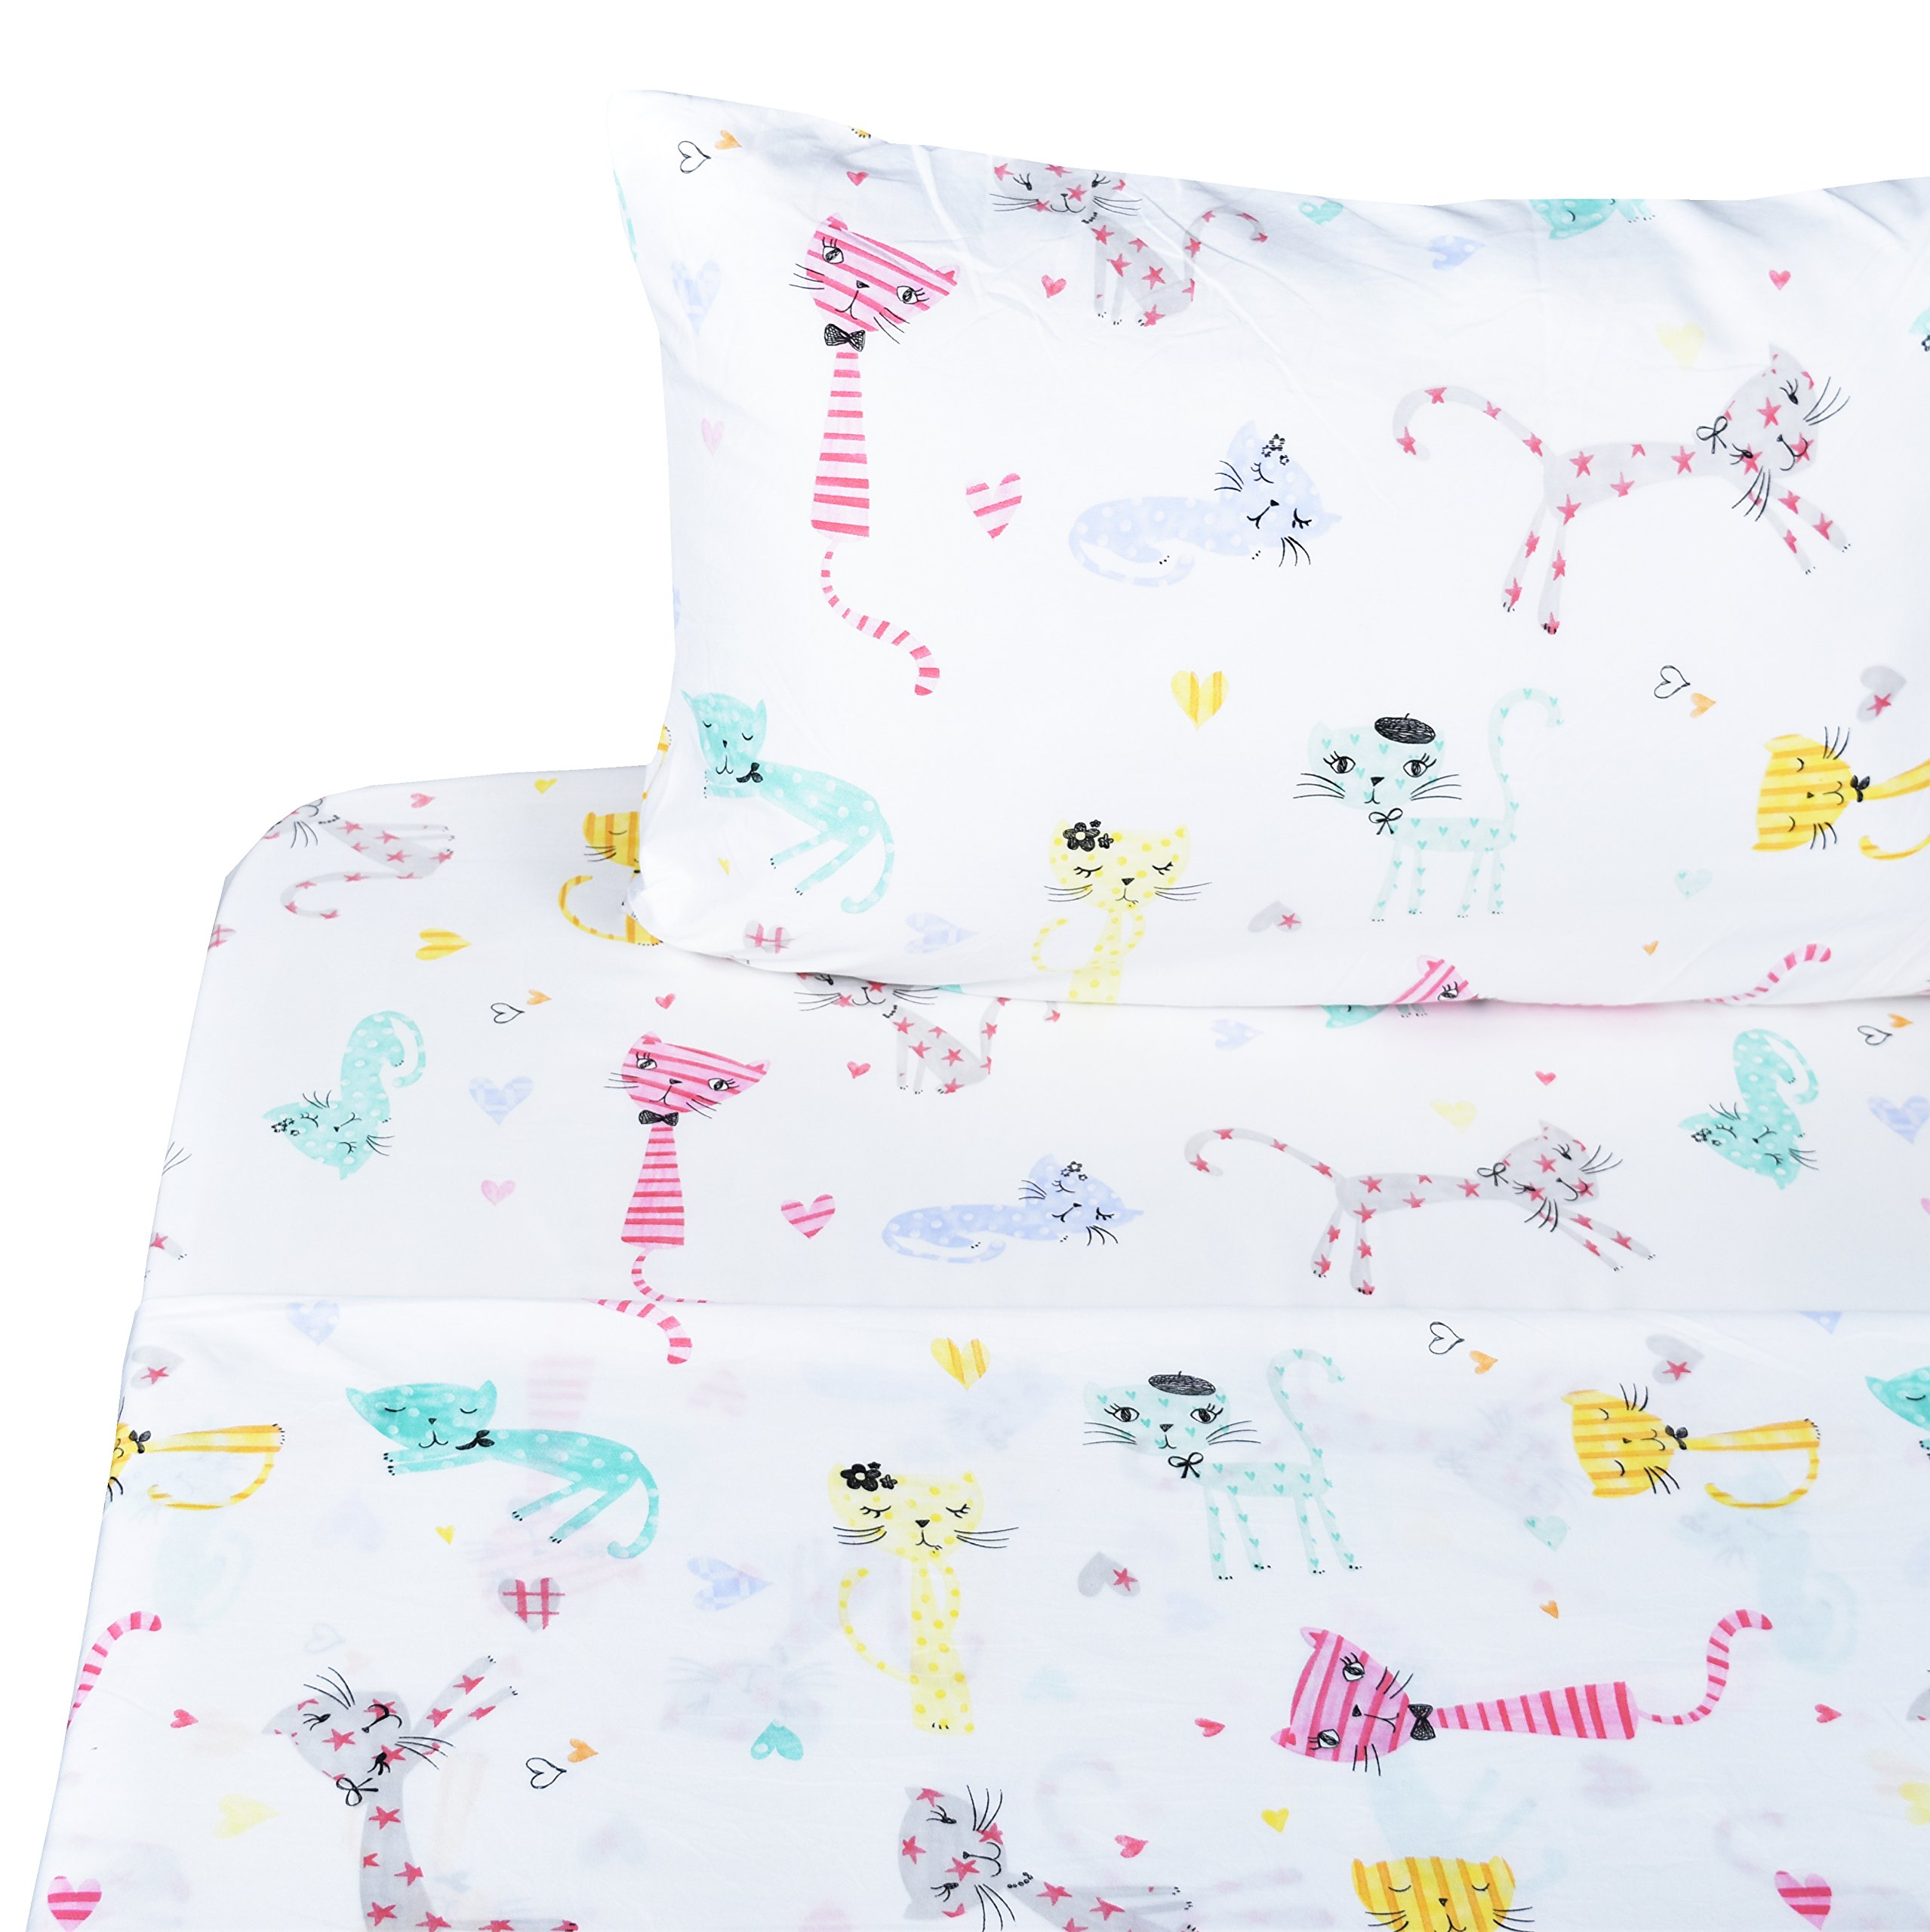 Scientific Sleep Cute Kitty Cats Soft Sheets Set Full, 100% Microfiber Polyester Bedding Sheet Set for Girls Gift (6, Full)